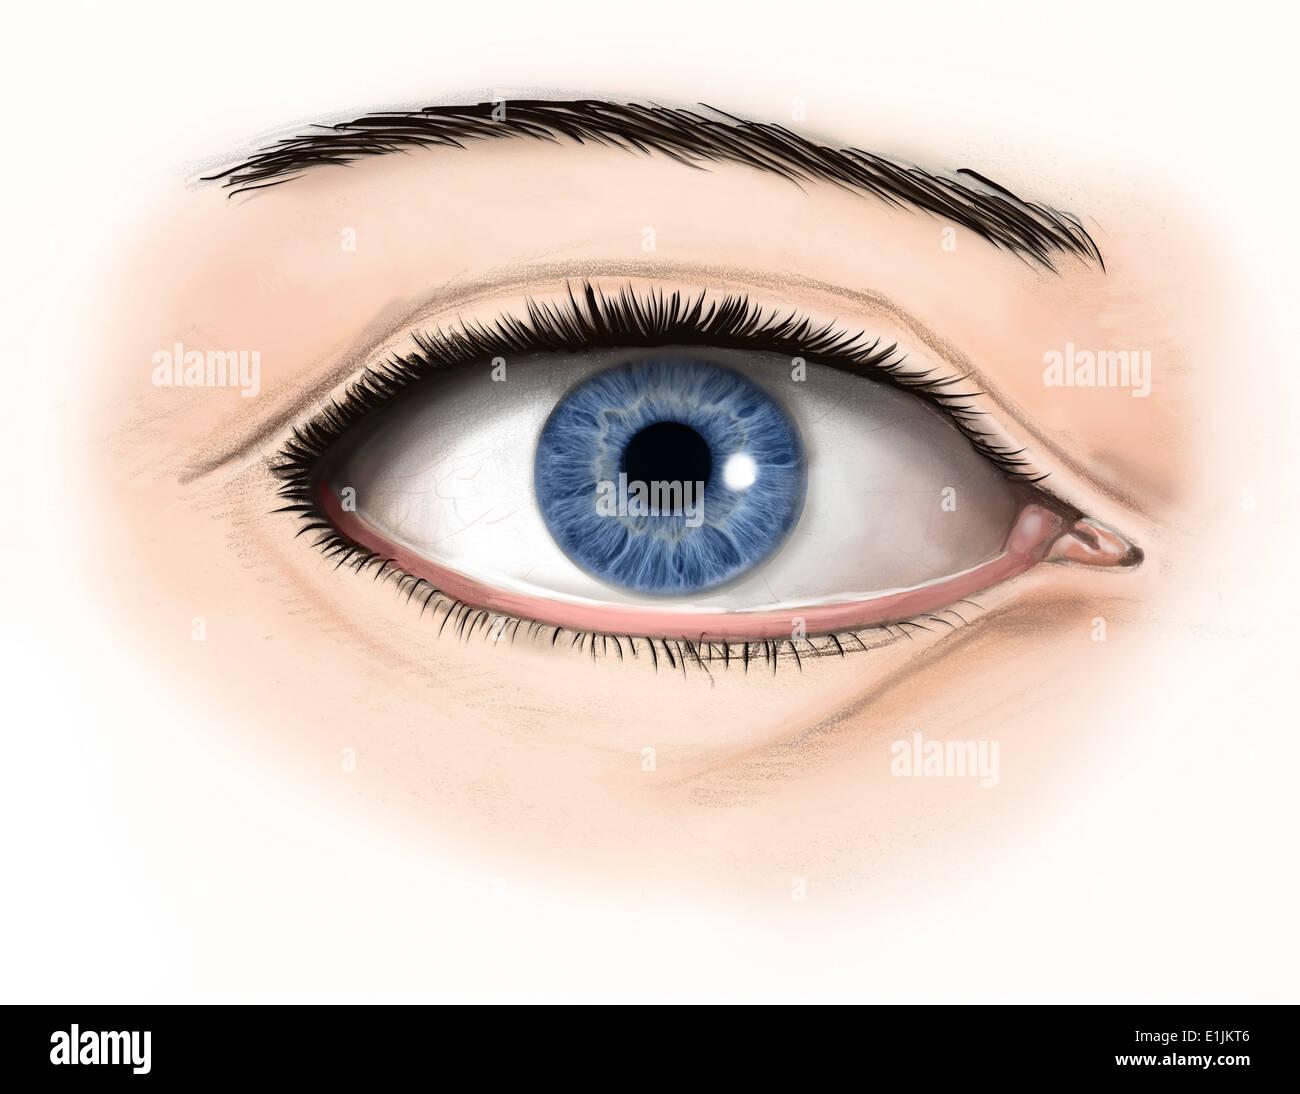 External Anatomy Of The Human Eye Stock Photo 69866838 Alamy